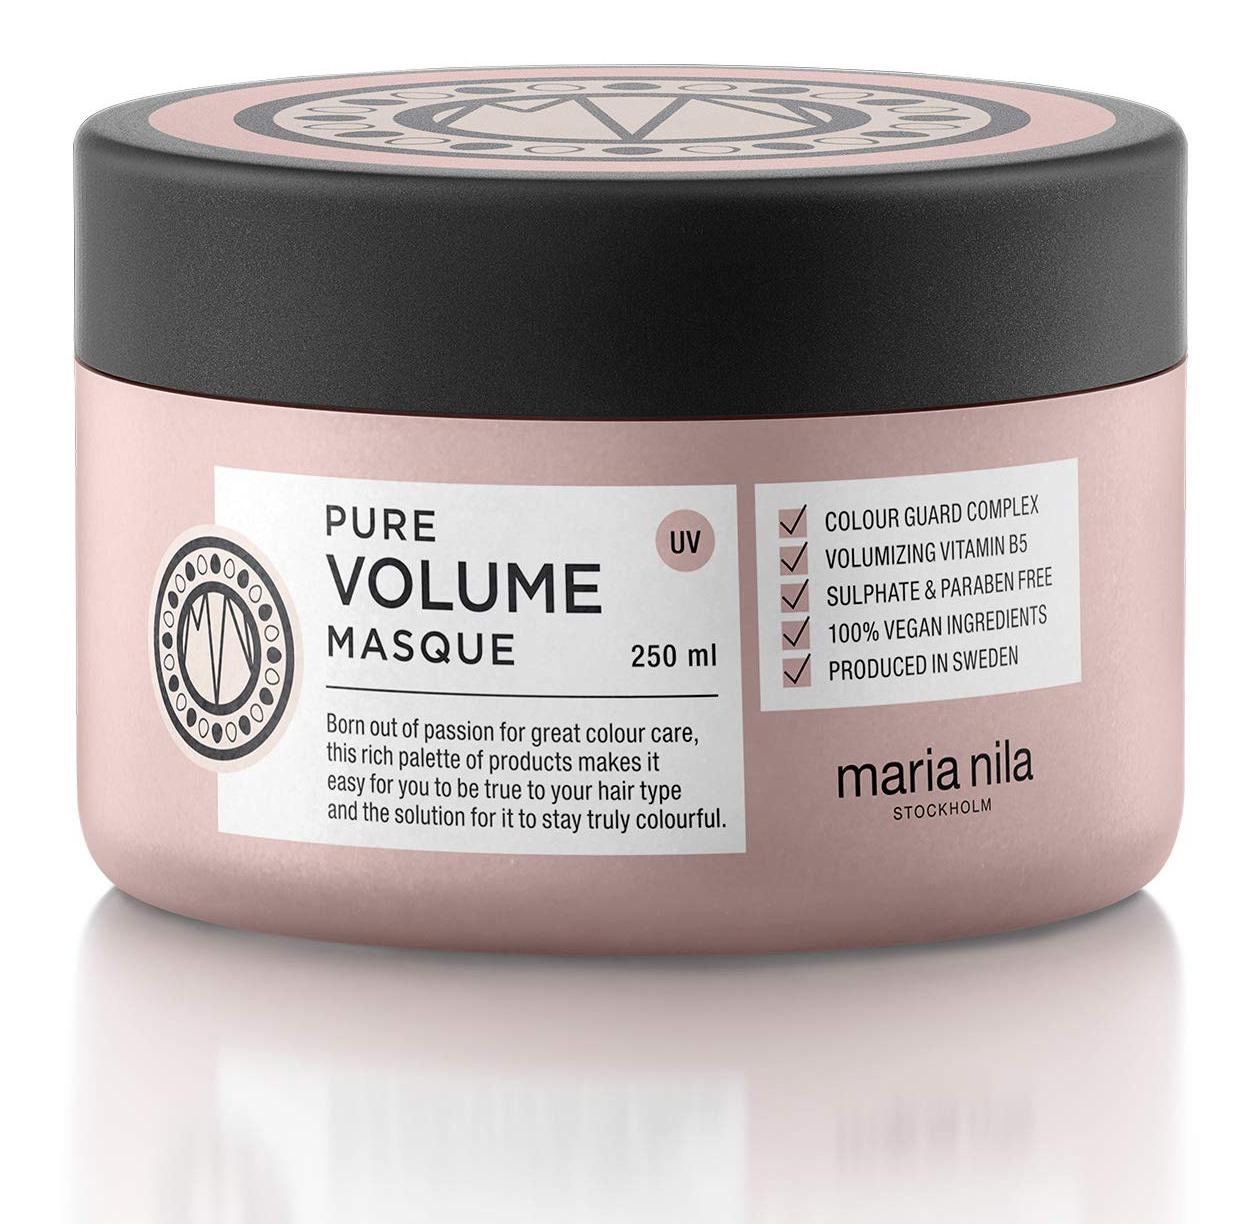 Maria Nila Pure Volume Masque